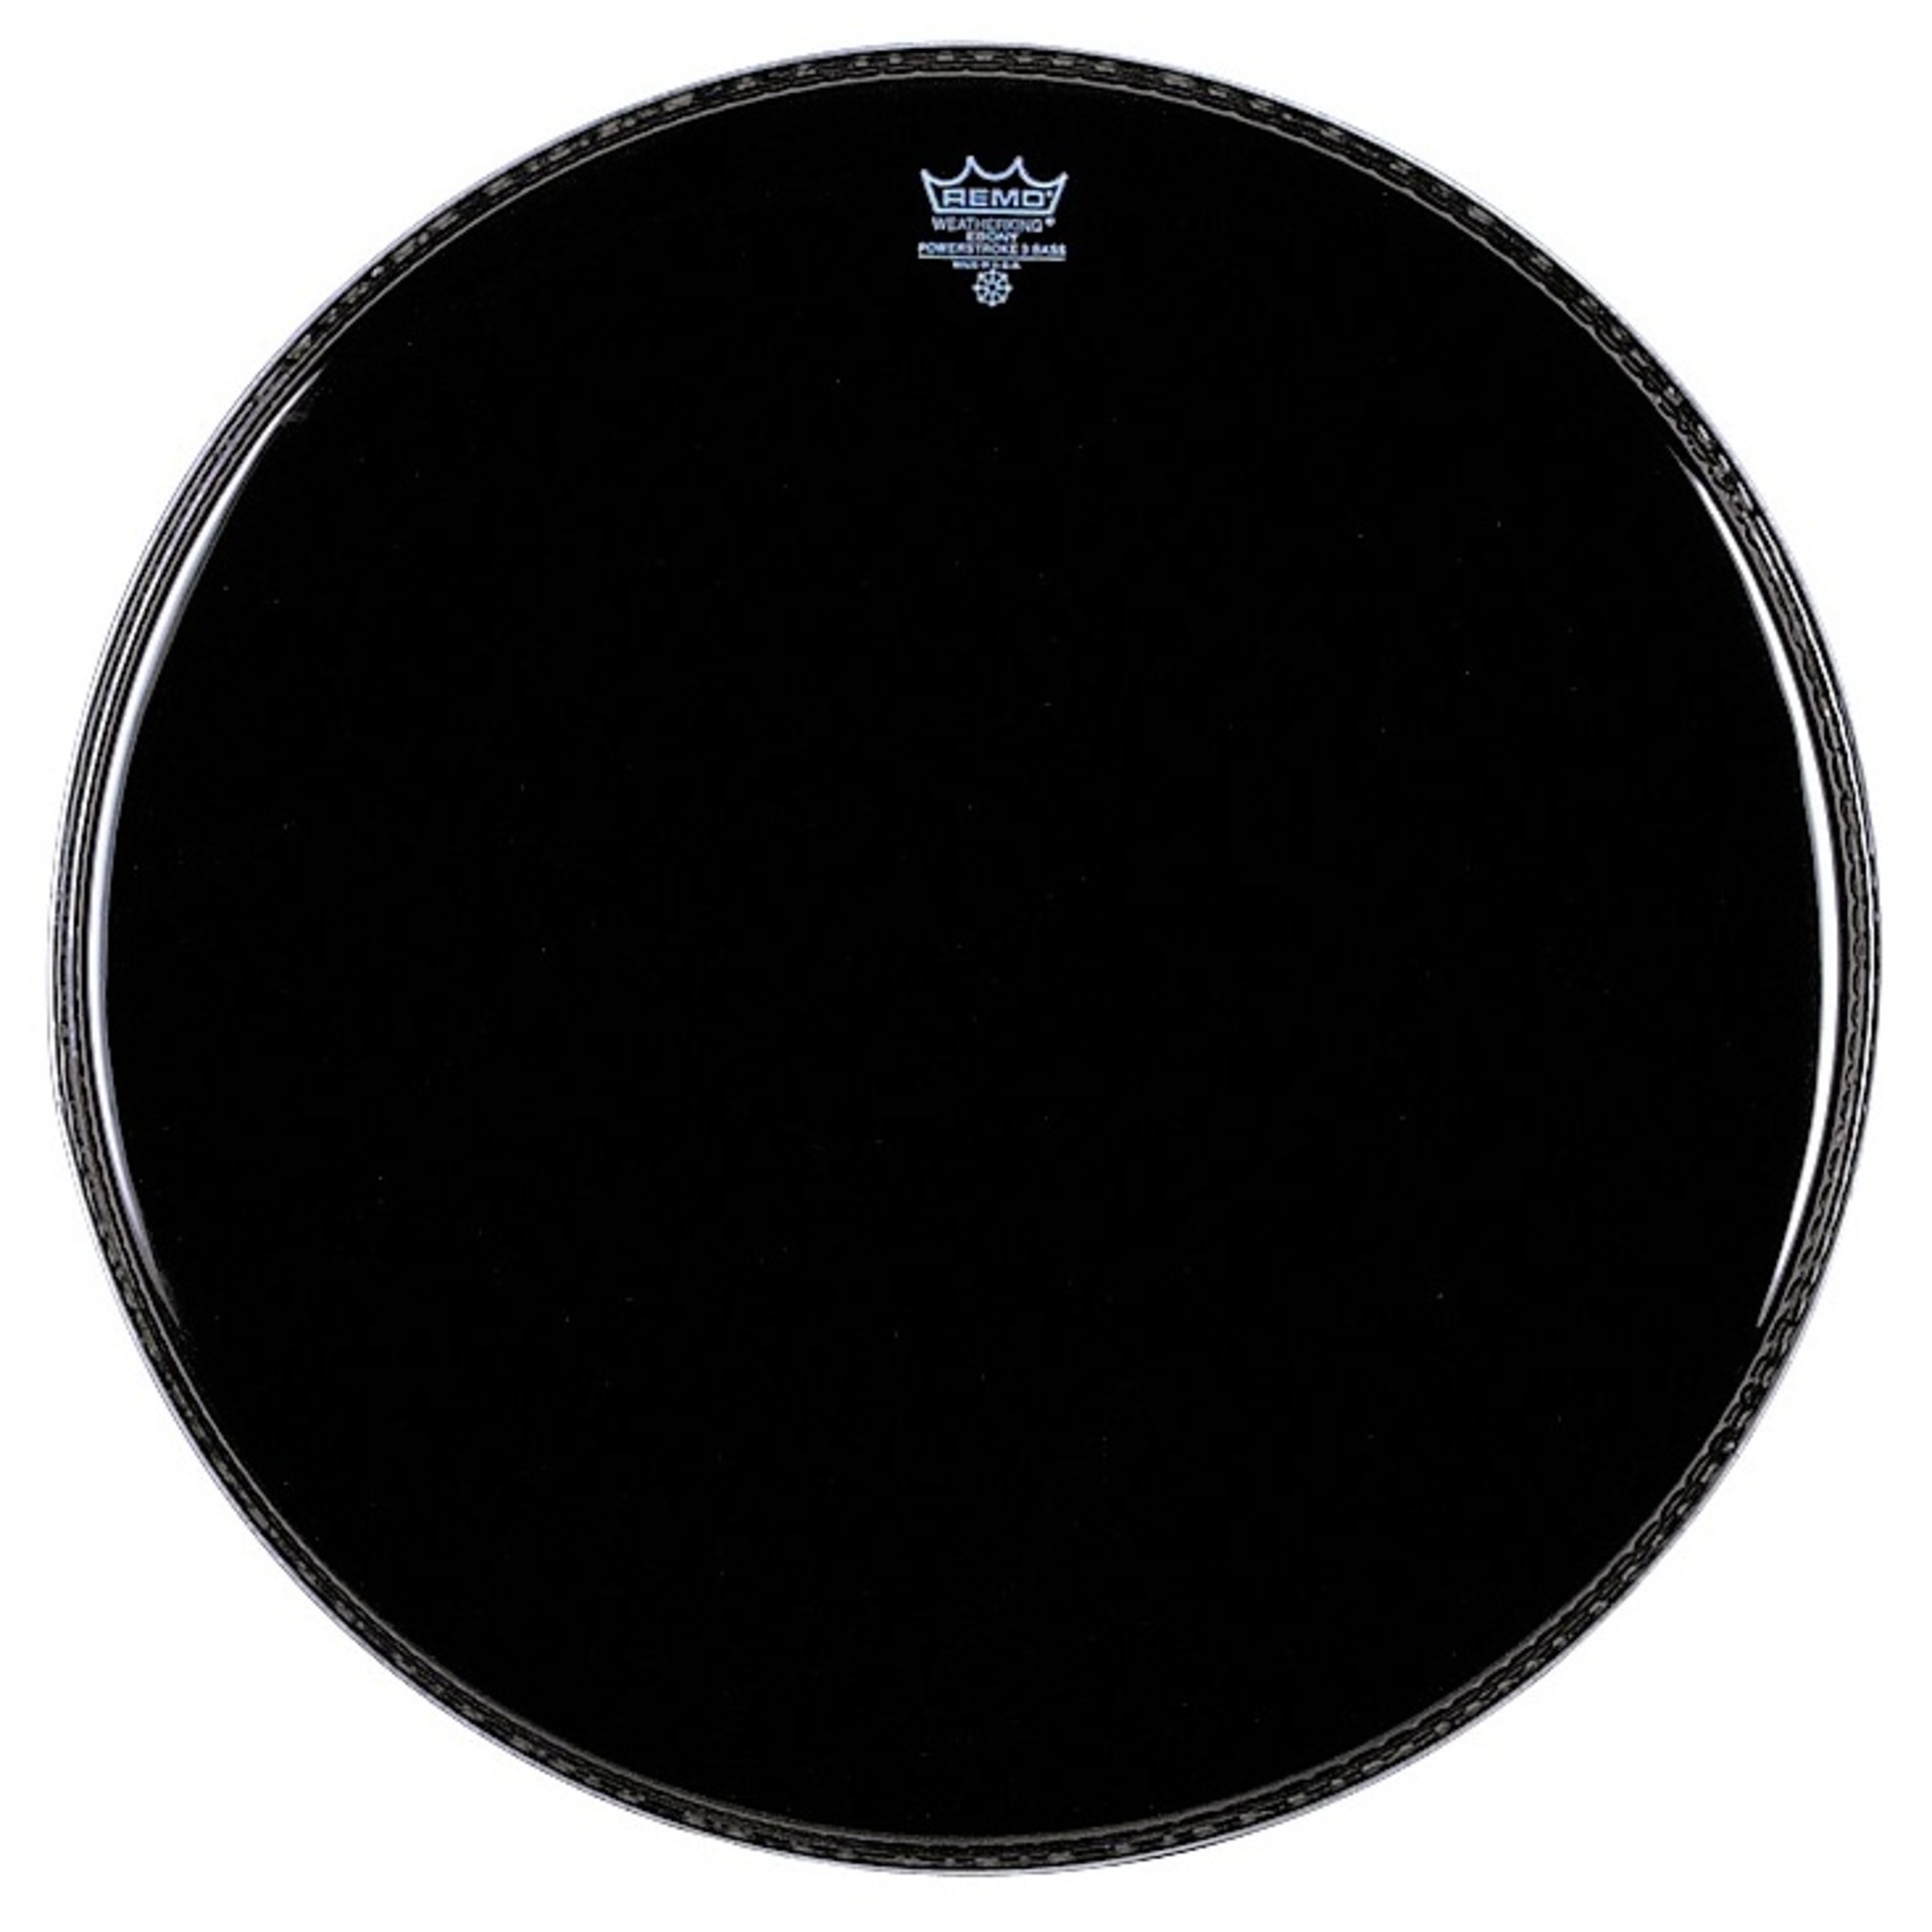 remo powerstroke 3 bass drum ebony giggear. Black Bedroom Furniture Sets. Home Design Ideas